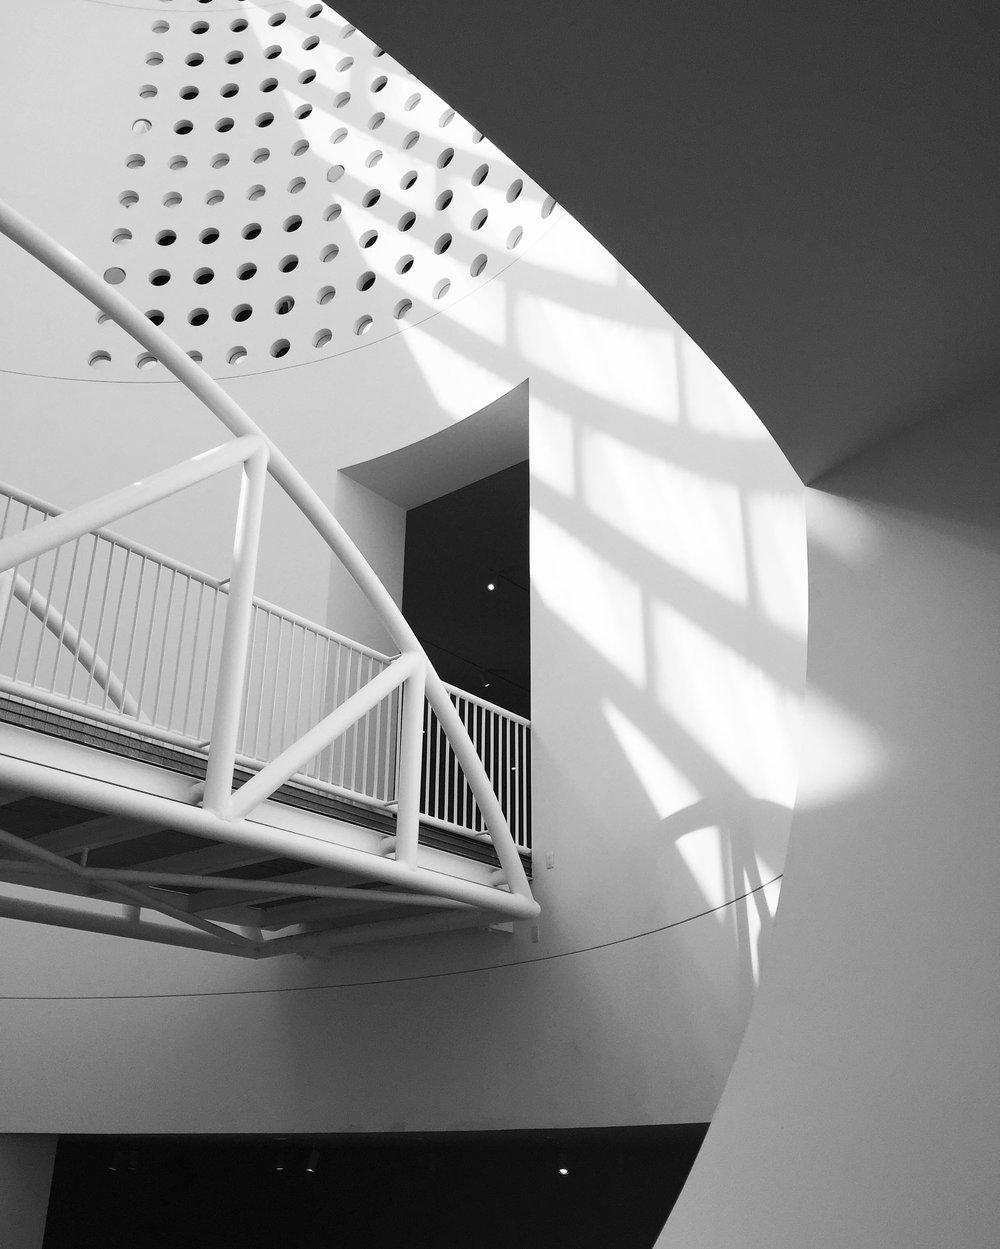 veronica lee sfmoma black and white architecture oculus bridge